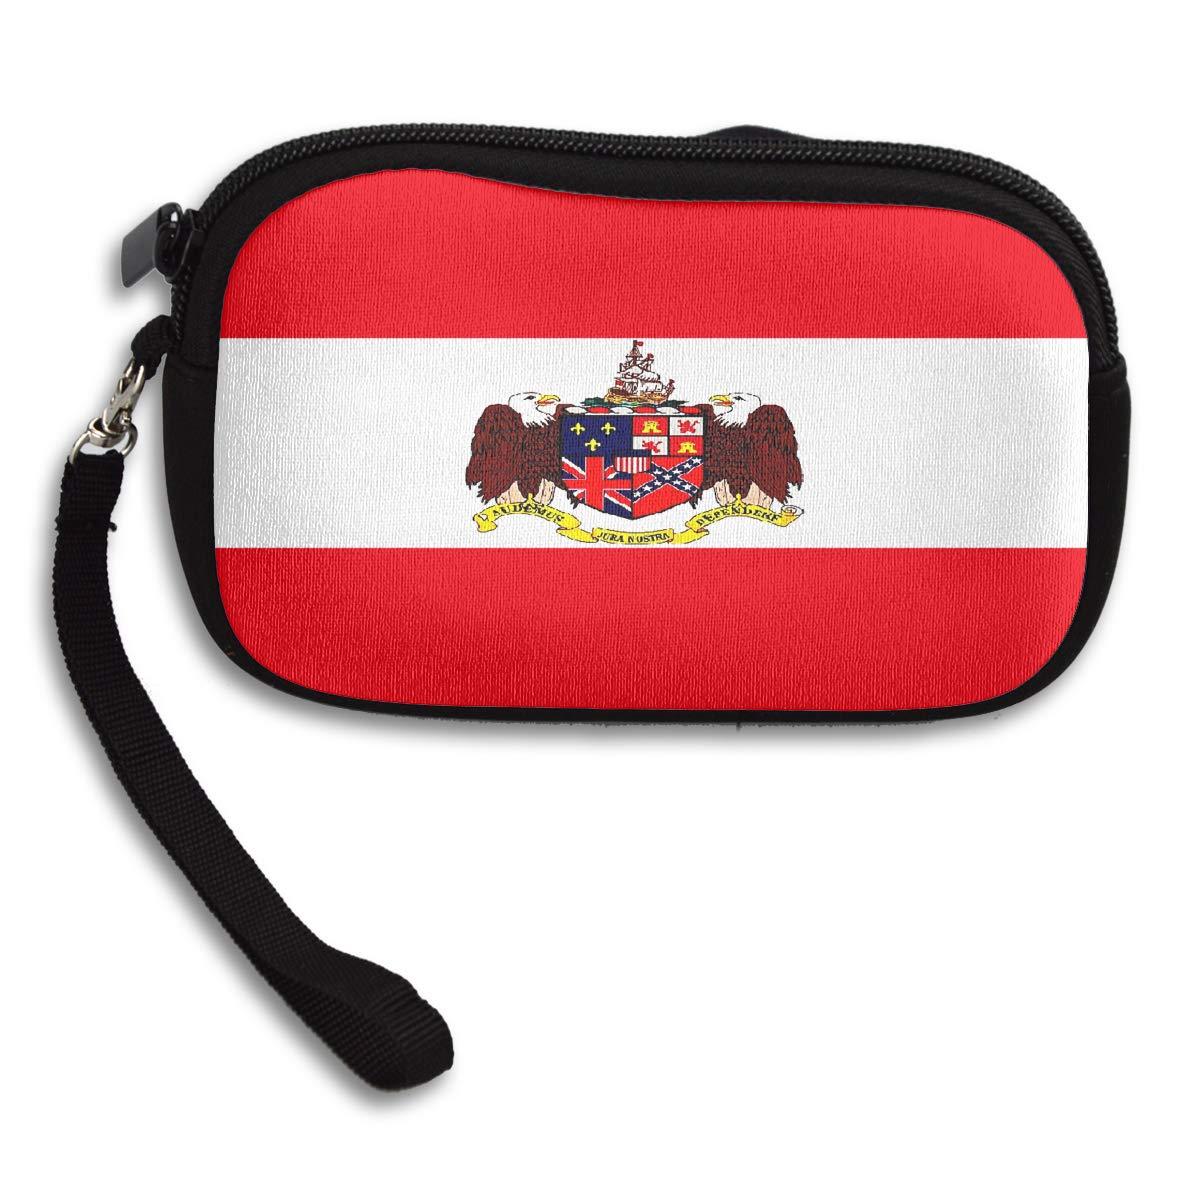 Creative Alabama Flag Coin Purse Stylish Change Purse,Make Up Bag,Cellphone Bag With Handle Purses For Women